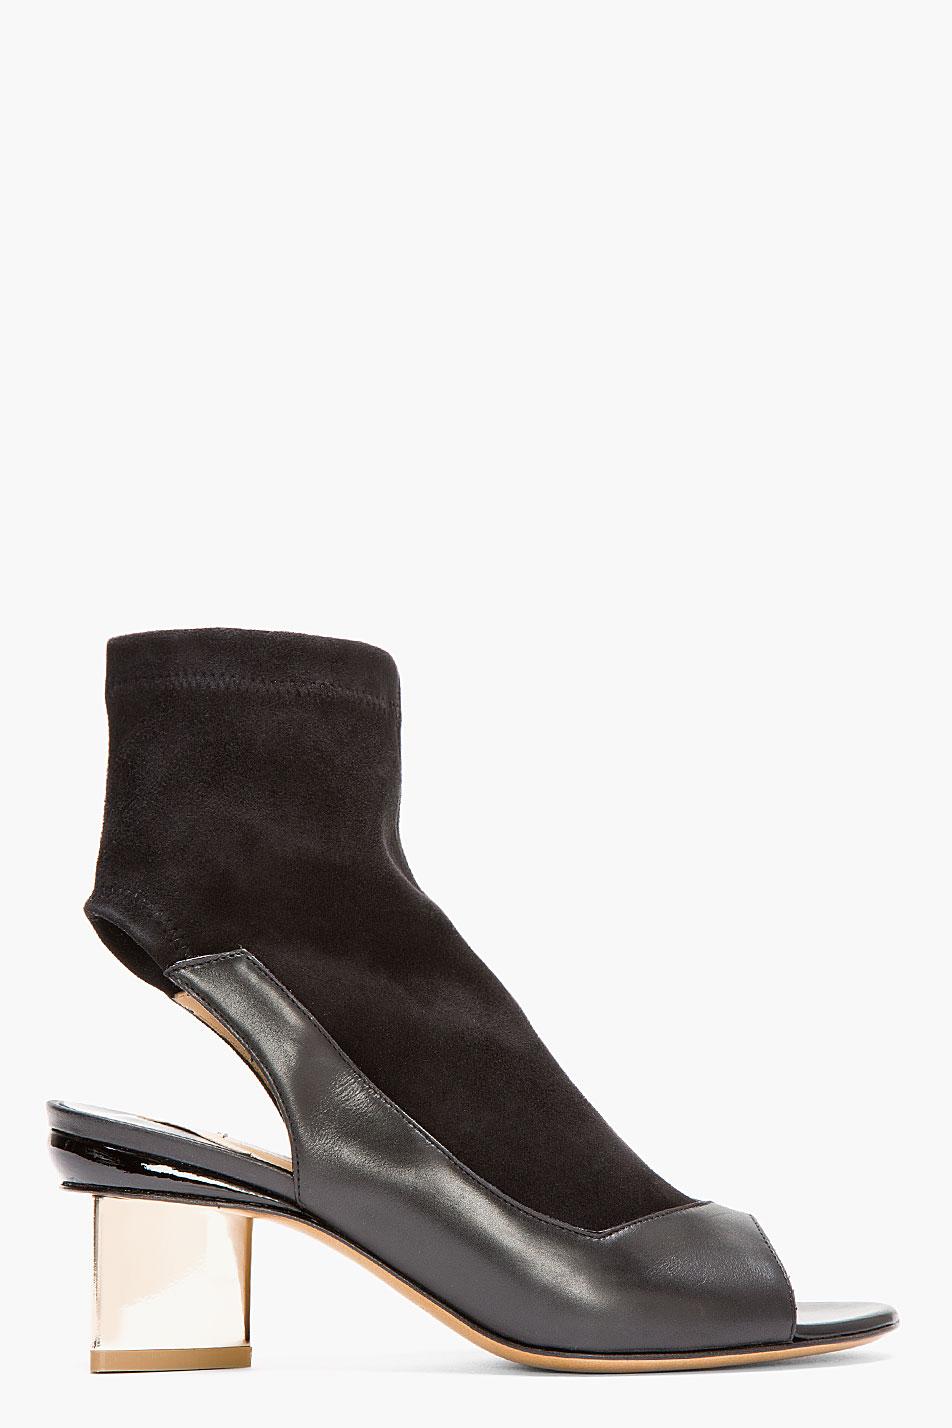 nicholas kirkwood black suede and leather gold heeled cut